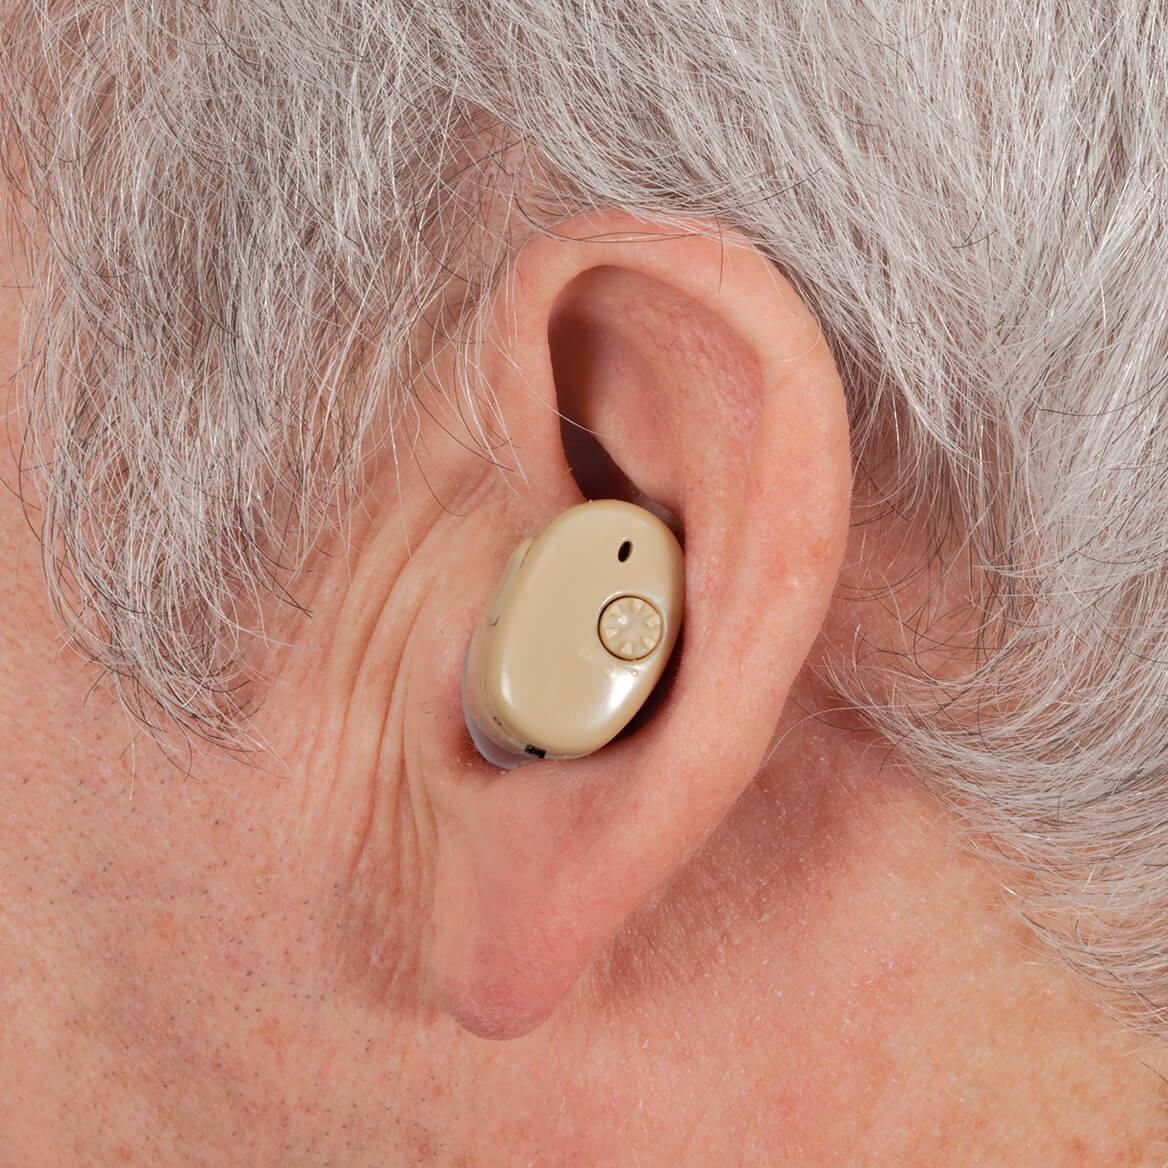 AcuTrue® Rechargeable Hearing Amplifier, Set of 2-355588